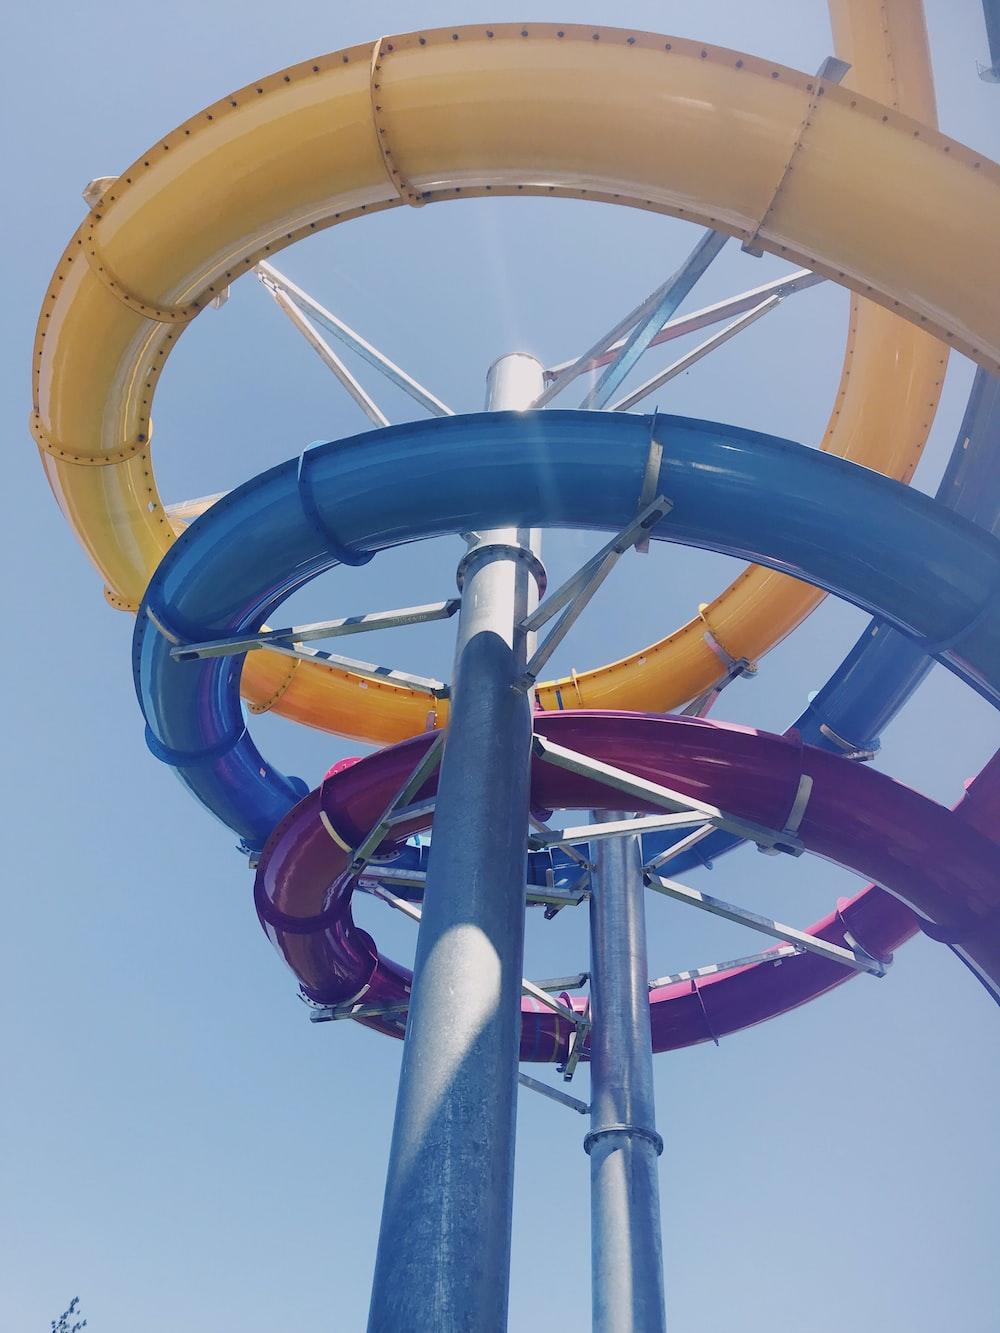 multicolored slide at daytime